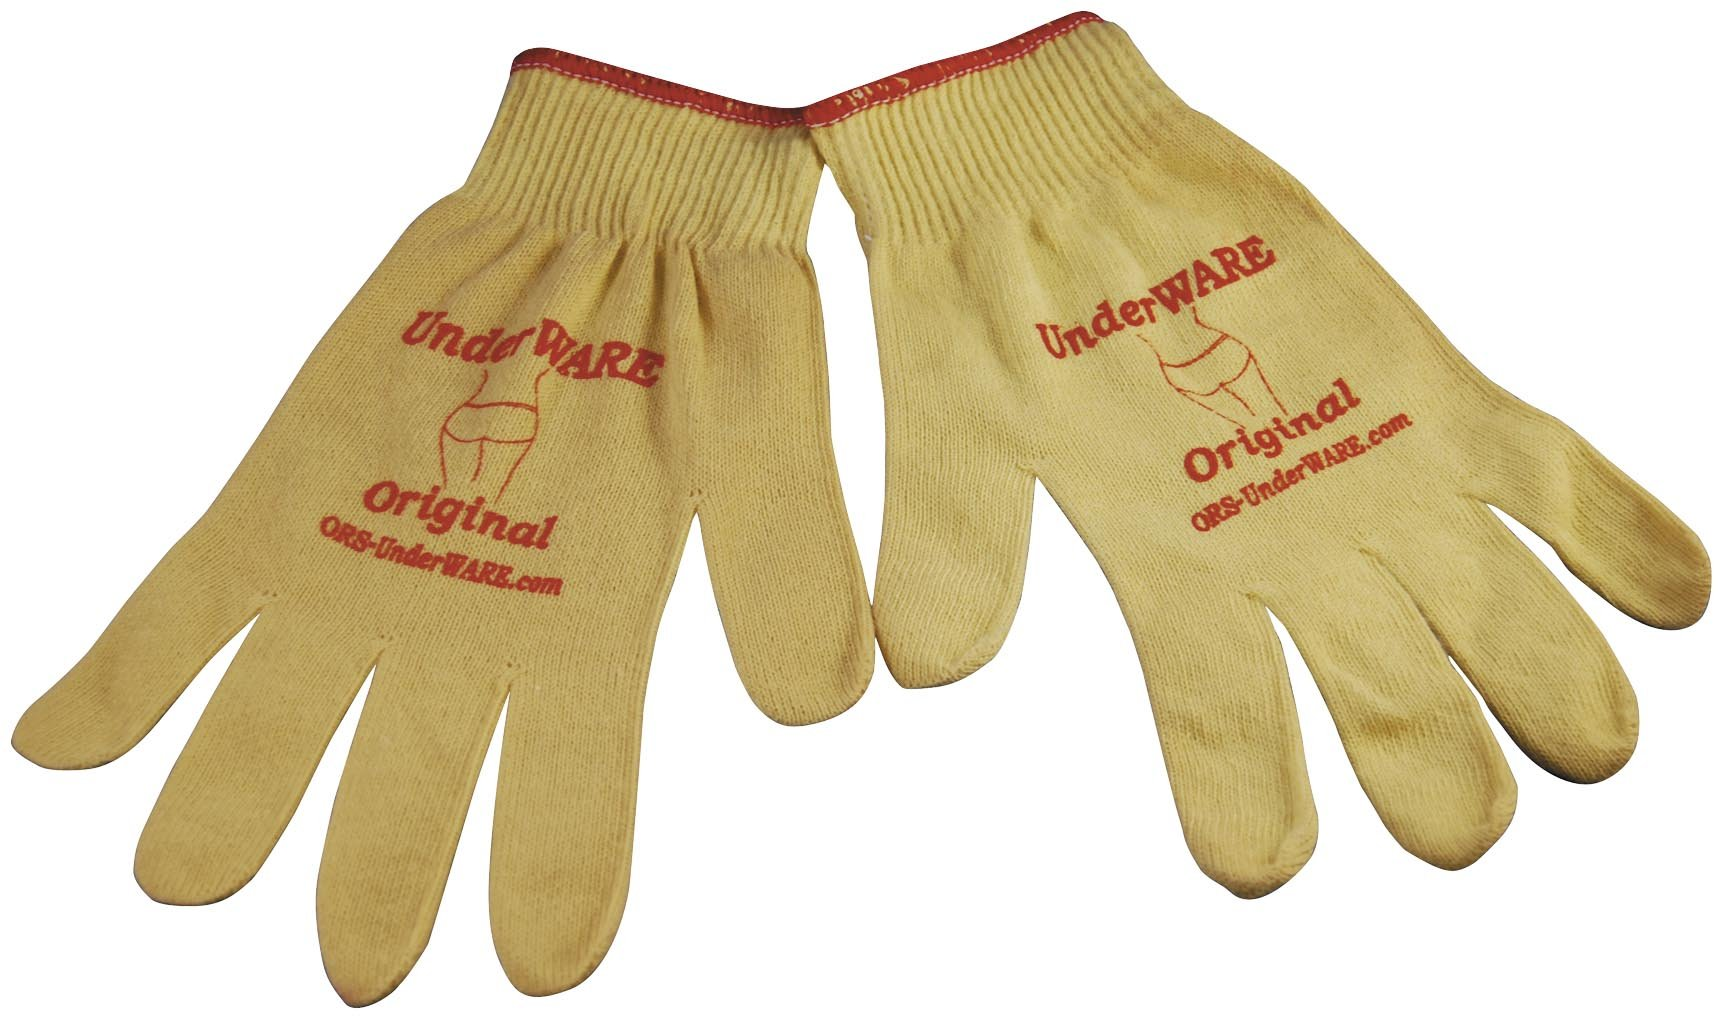 PC Racing Original Glove Liners (MEDIUM) (MEDIUM)